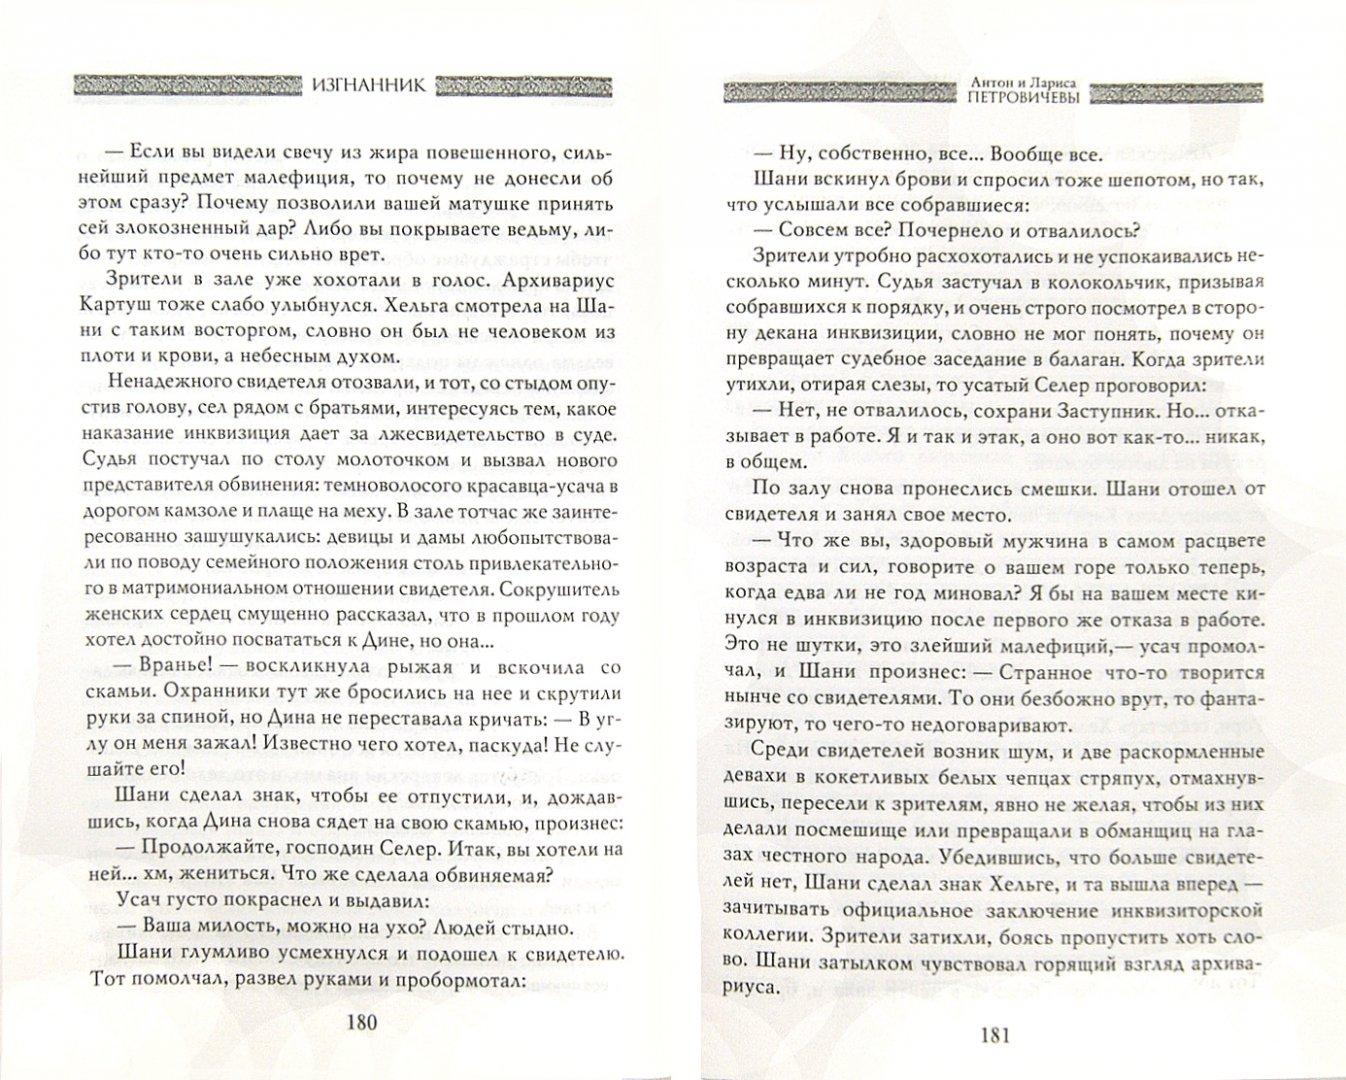 Иллюстрация 1 из 16 для Изгнанник - Петровичев, Петровичева   Лабиринт - книги. Источник: Лабиринт